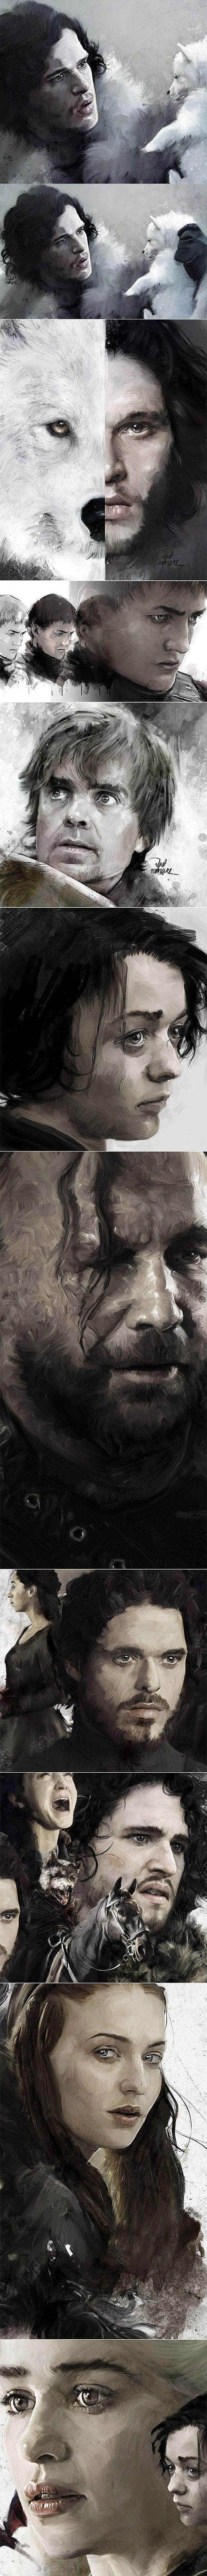 Artwork 'Game Of Thrones' on Behance Vlad Rodriguez